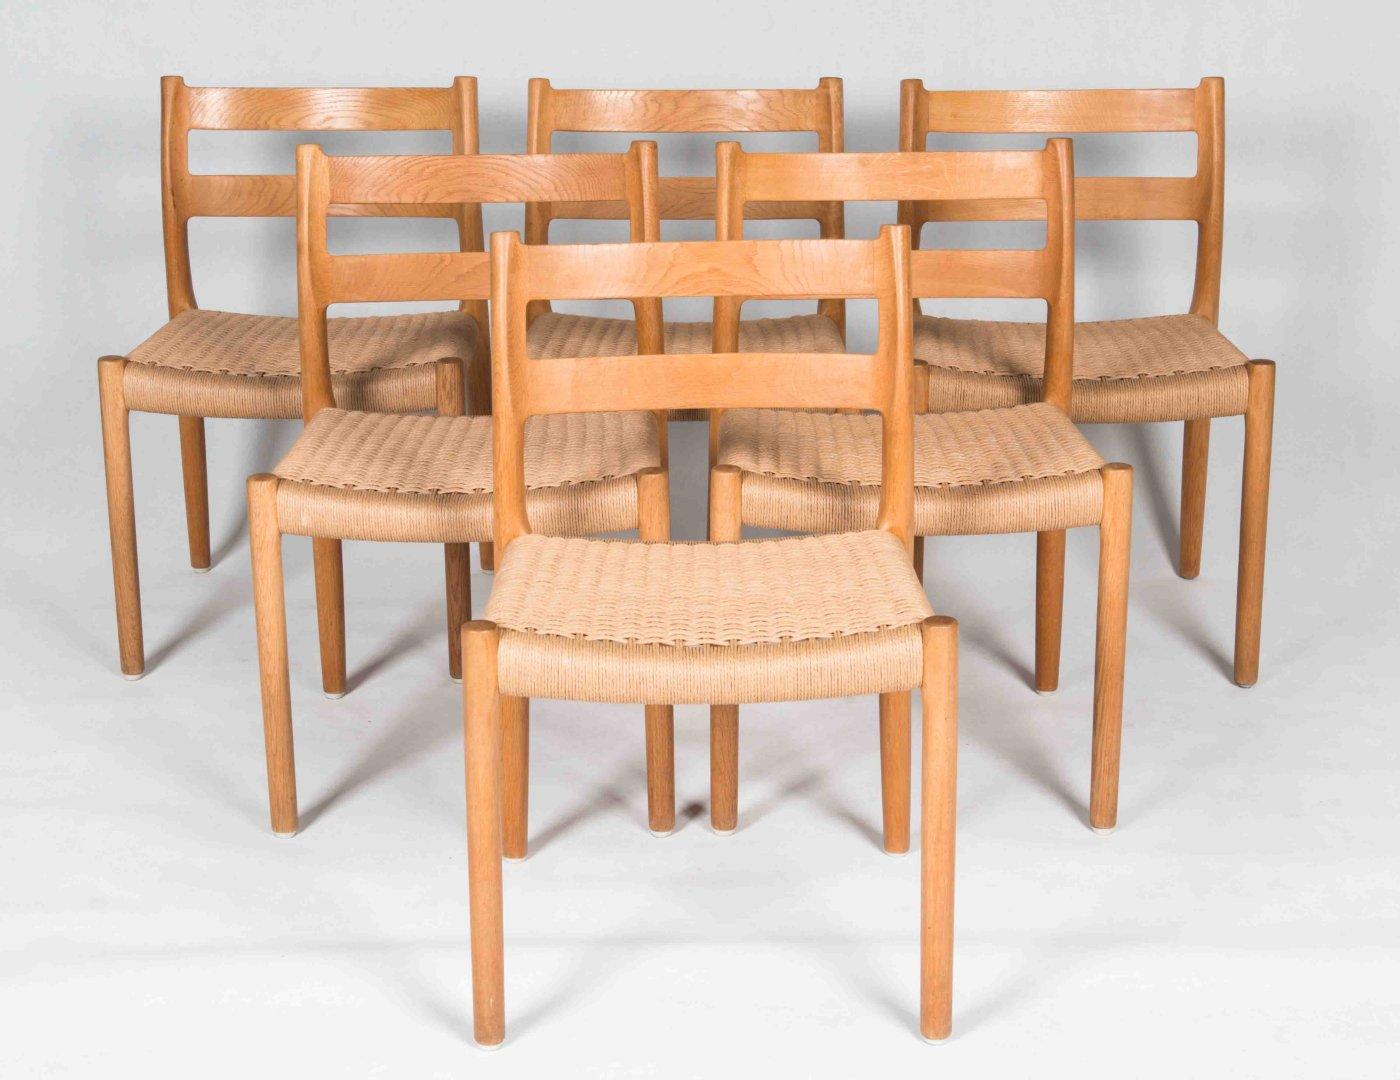 Danish vintage dining chairs n o moller oak